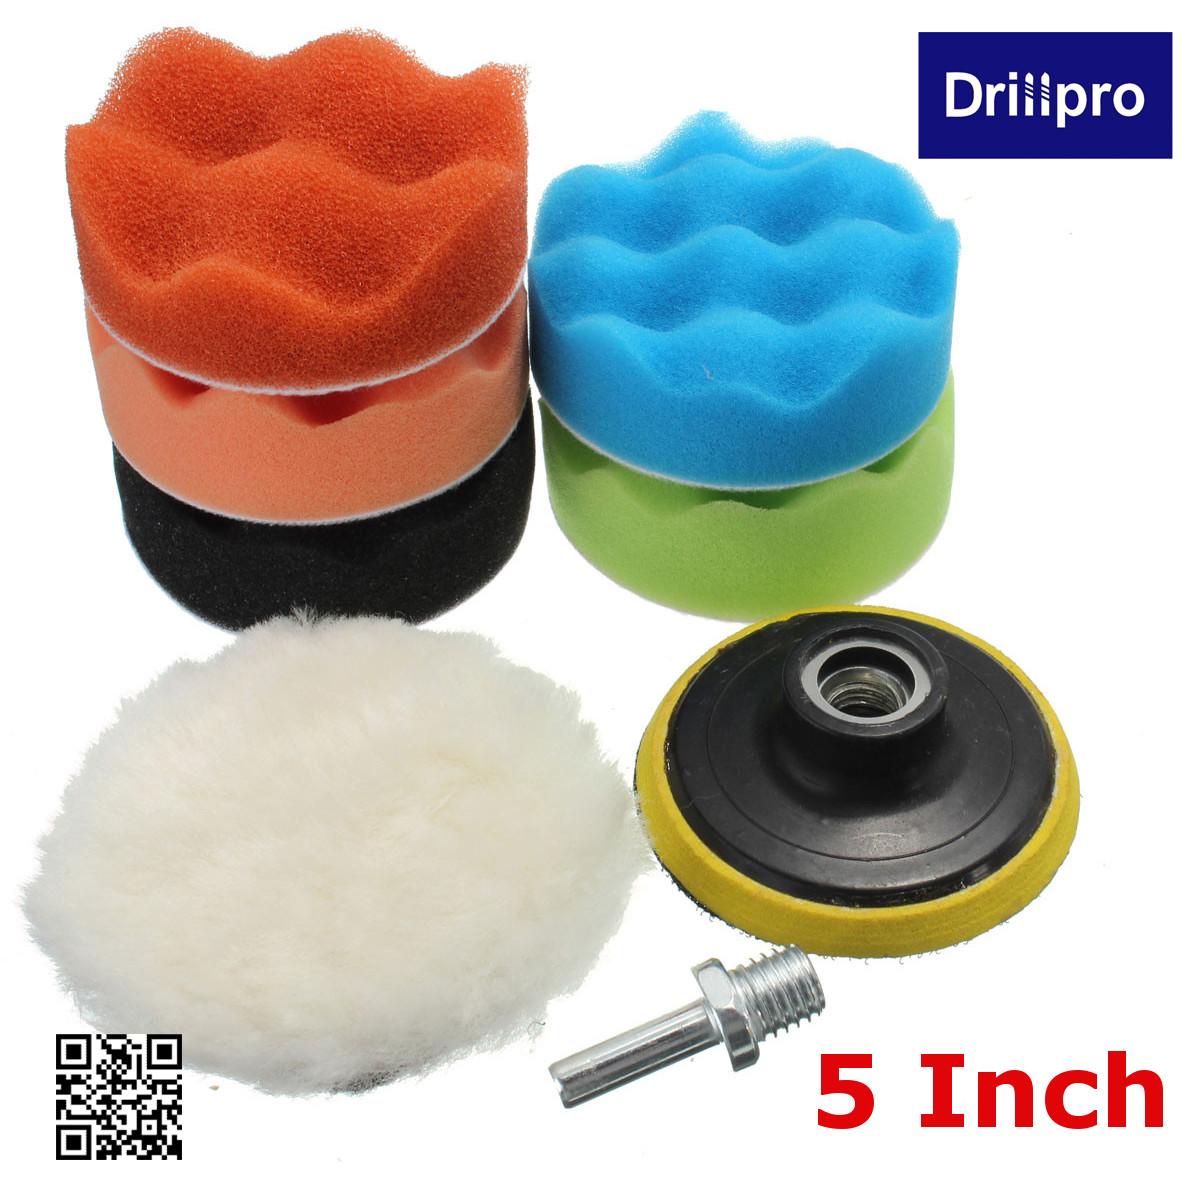 "7Pcs 3/5/6/7"" Sponge Polishing Waxing Buffing Pads Automotive Tools & Supplies Kit Set Compound For Auto Car"